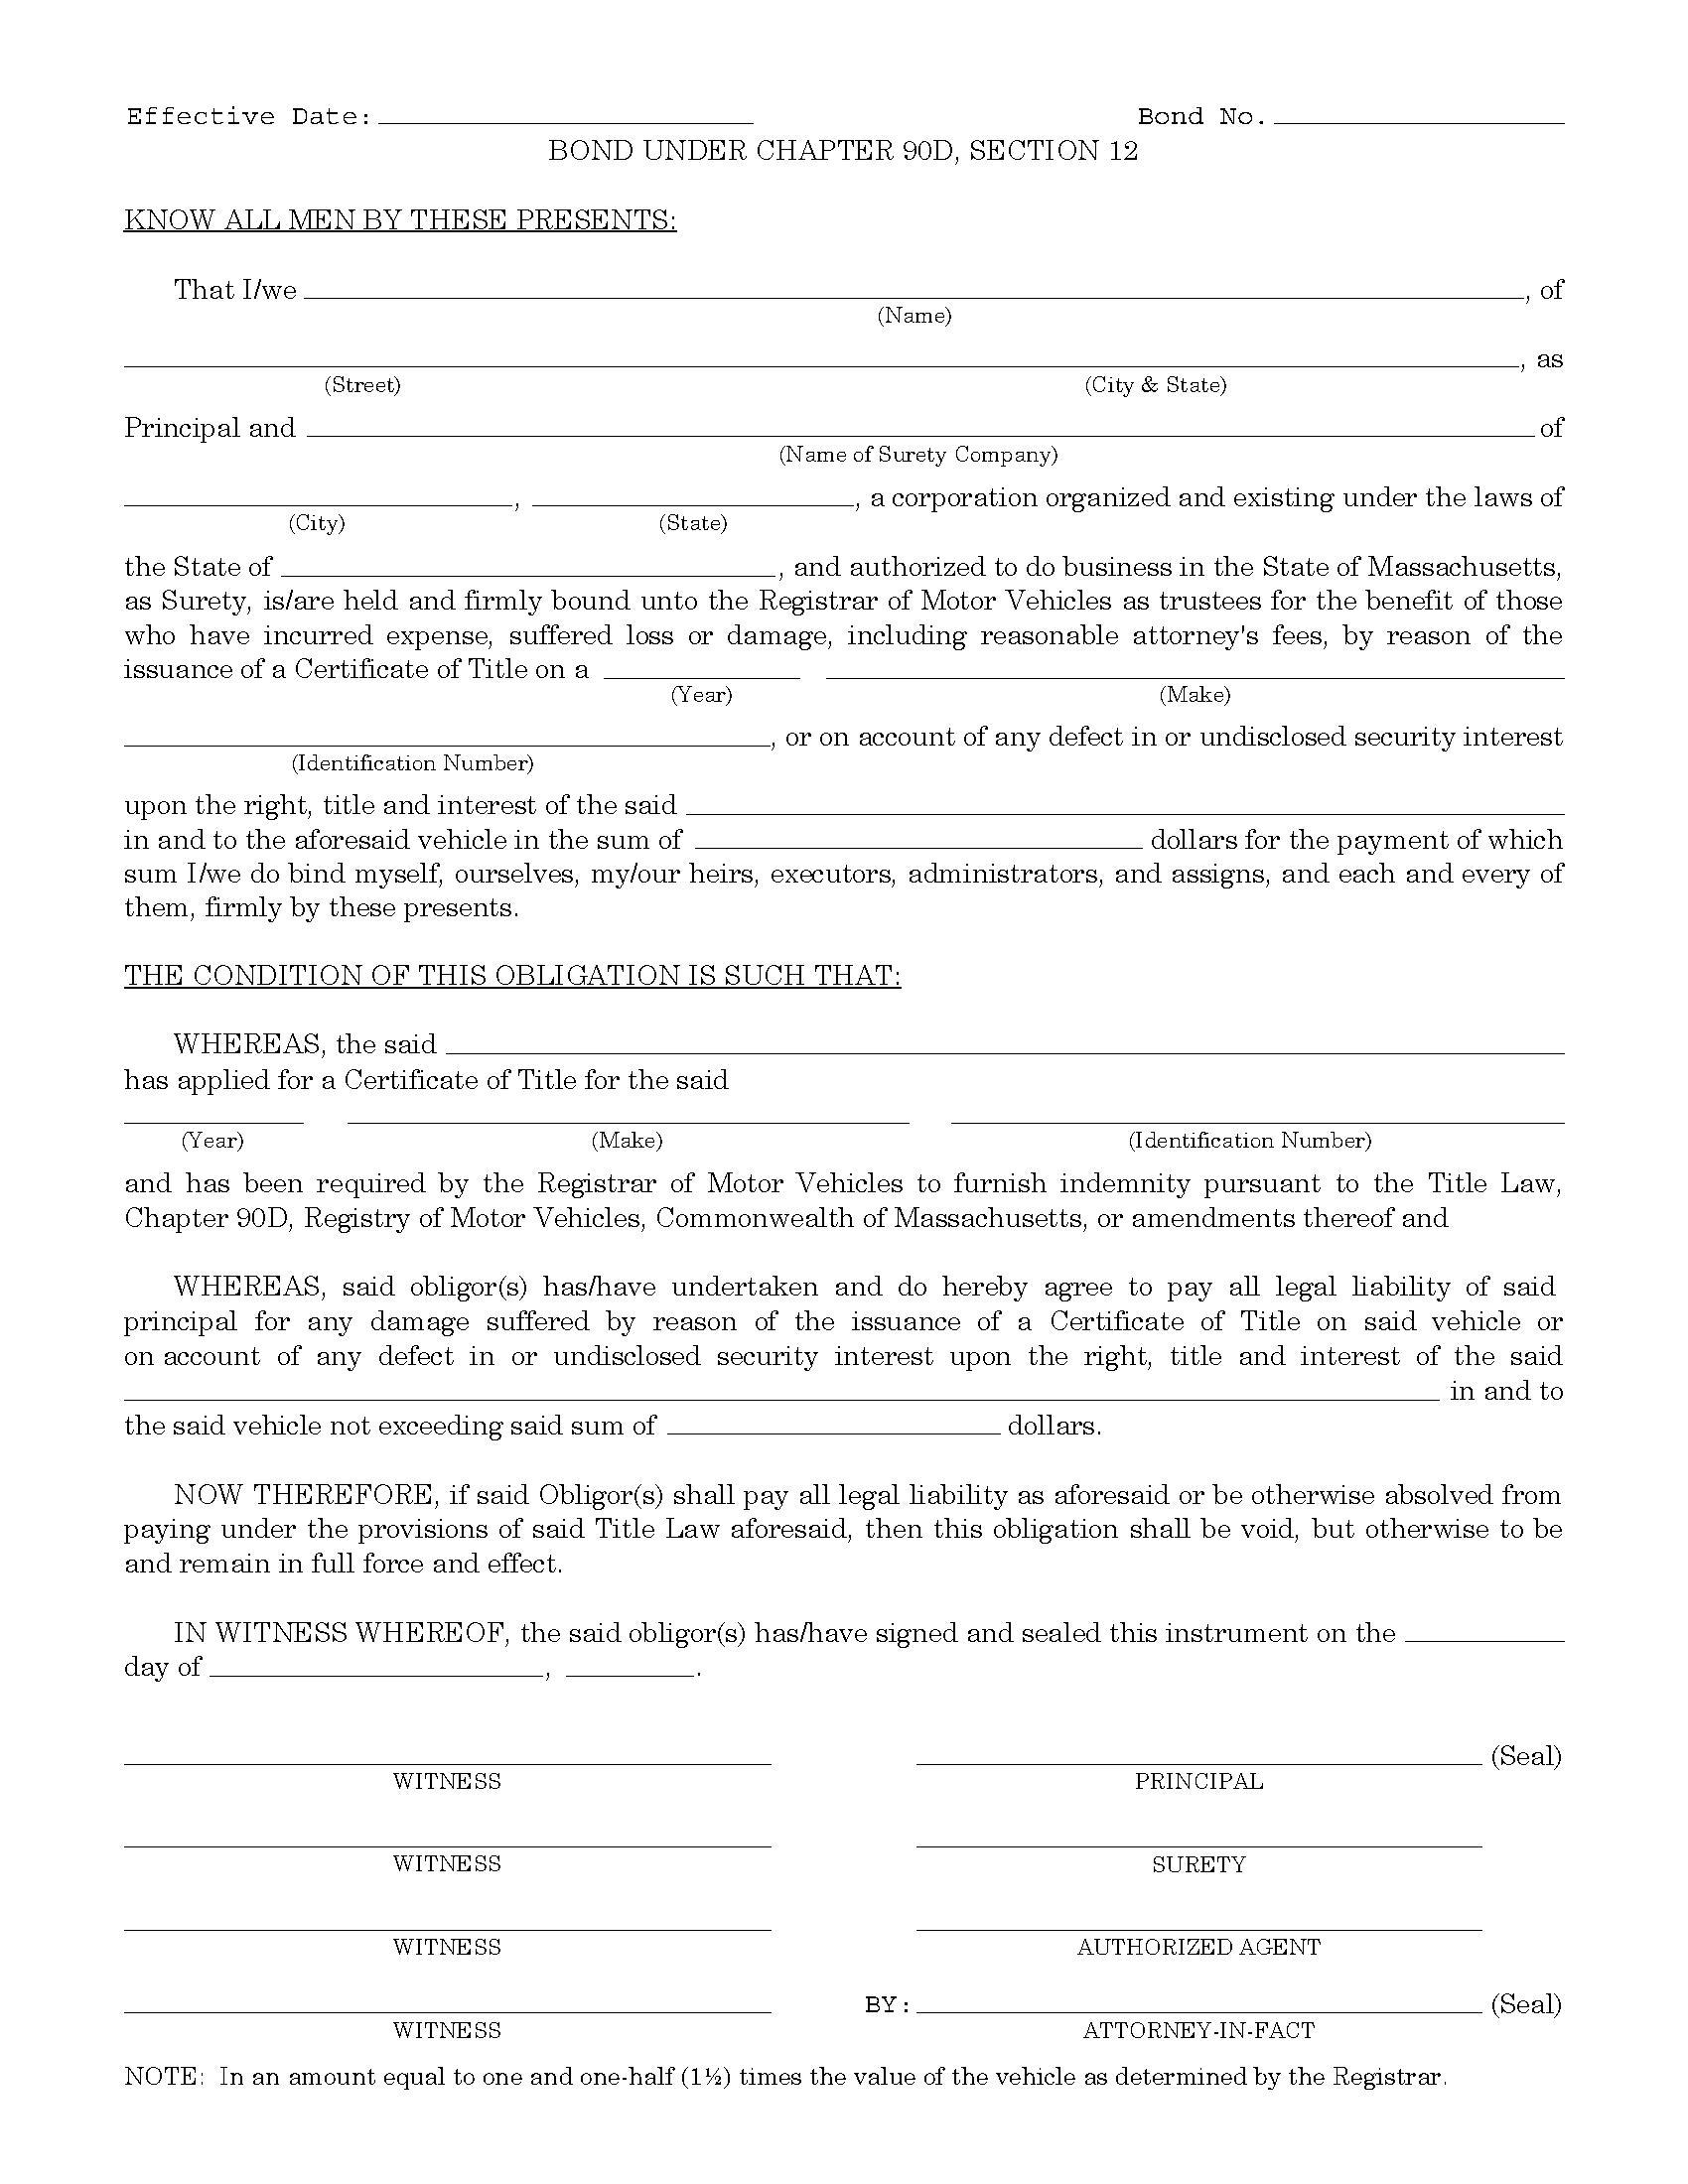 Commonwealth of Massachusetts Motor Vehicle Certificate of Title sample image